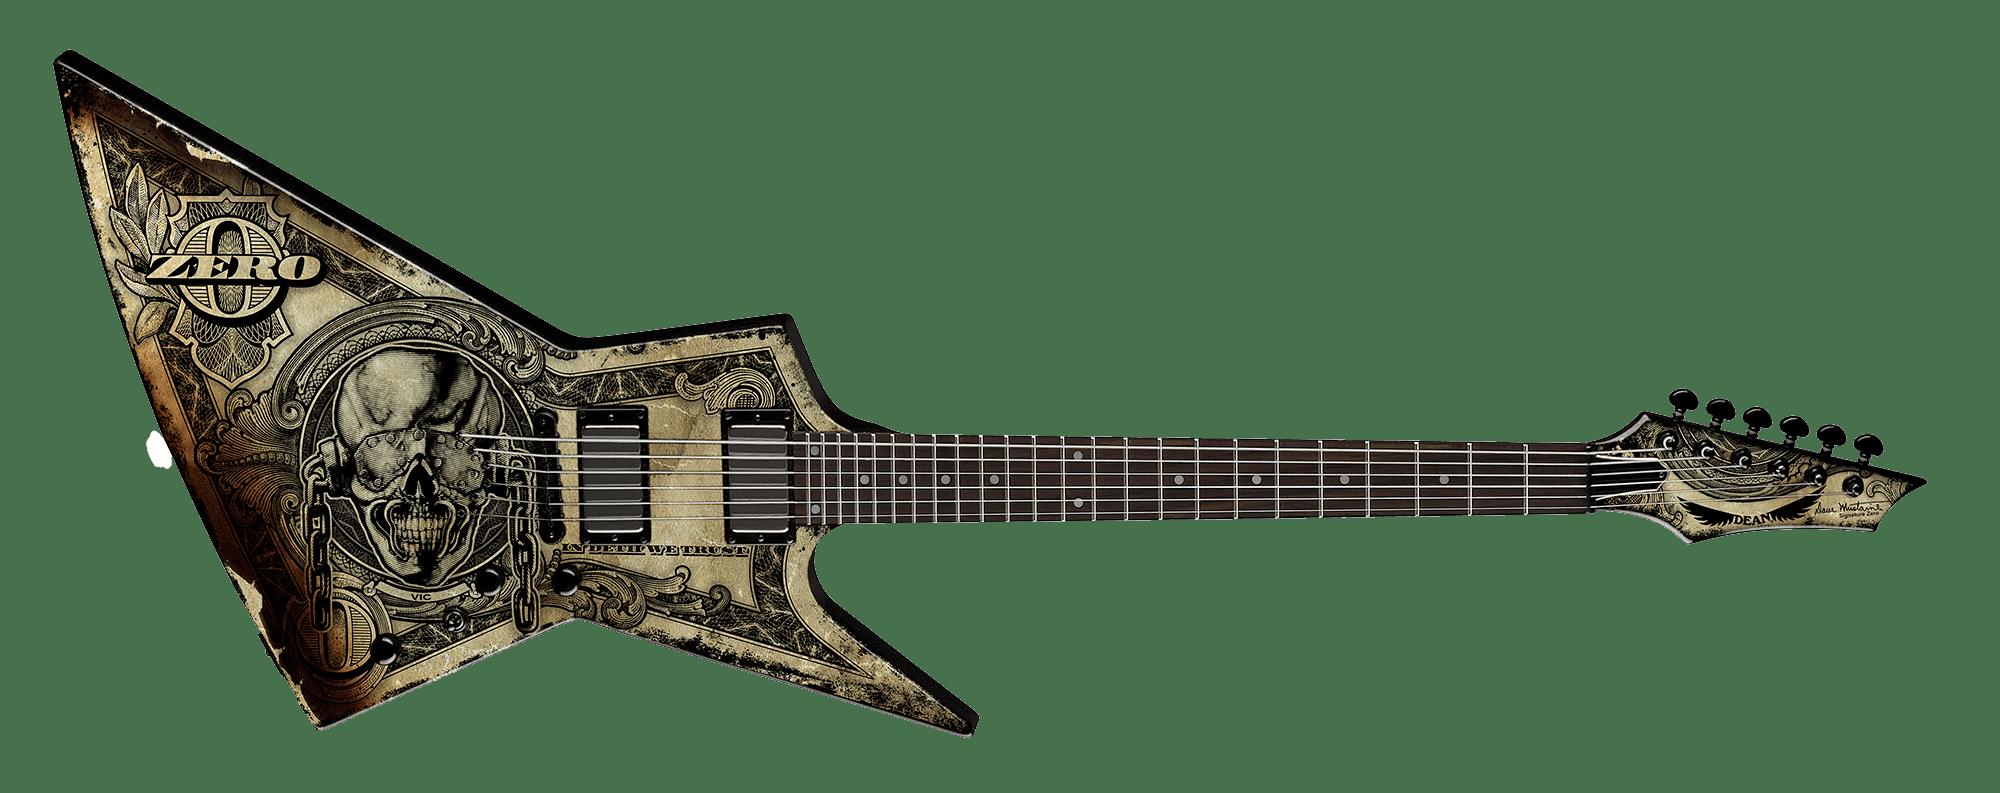 hight resolution of bootleg naraku guitars the guitar world pinterest guitars charvel wiring diagram wiring diagrams ernie ball sub wiring diagram schecter wiring diagram david